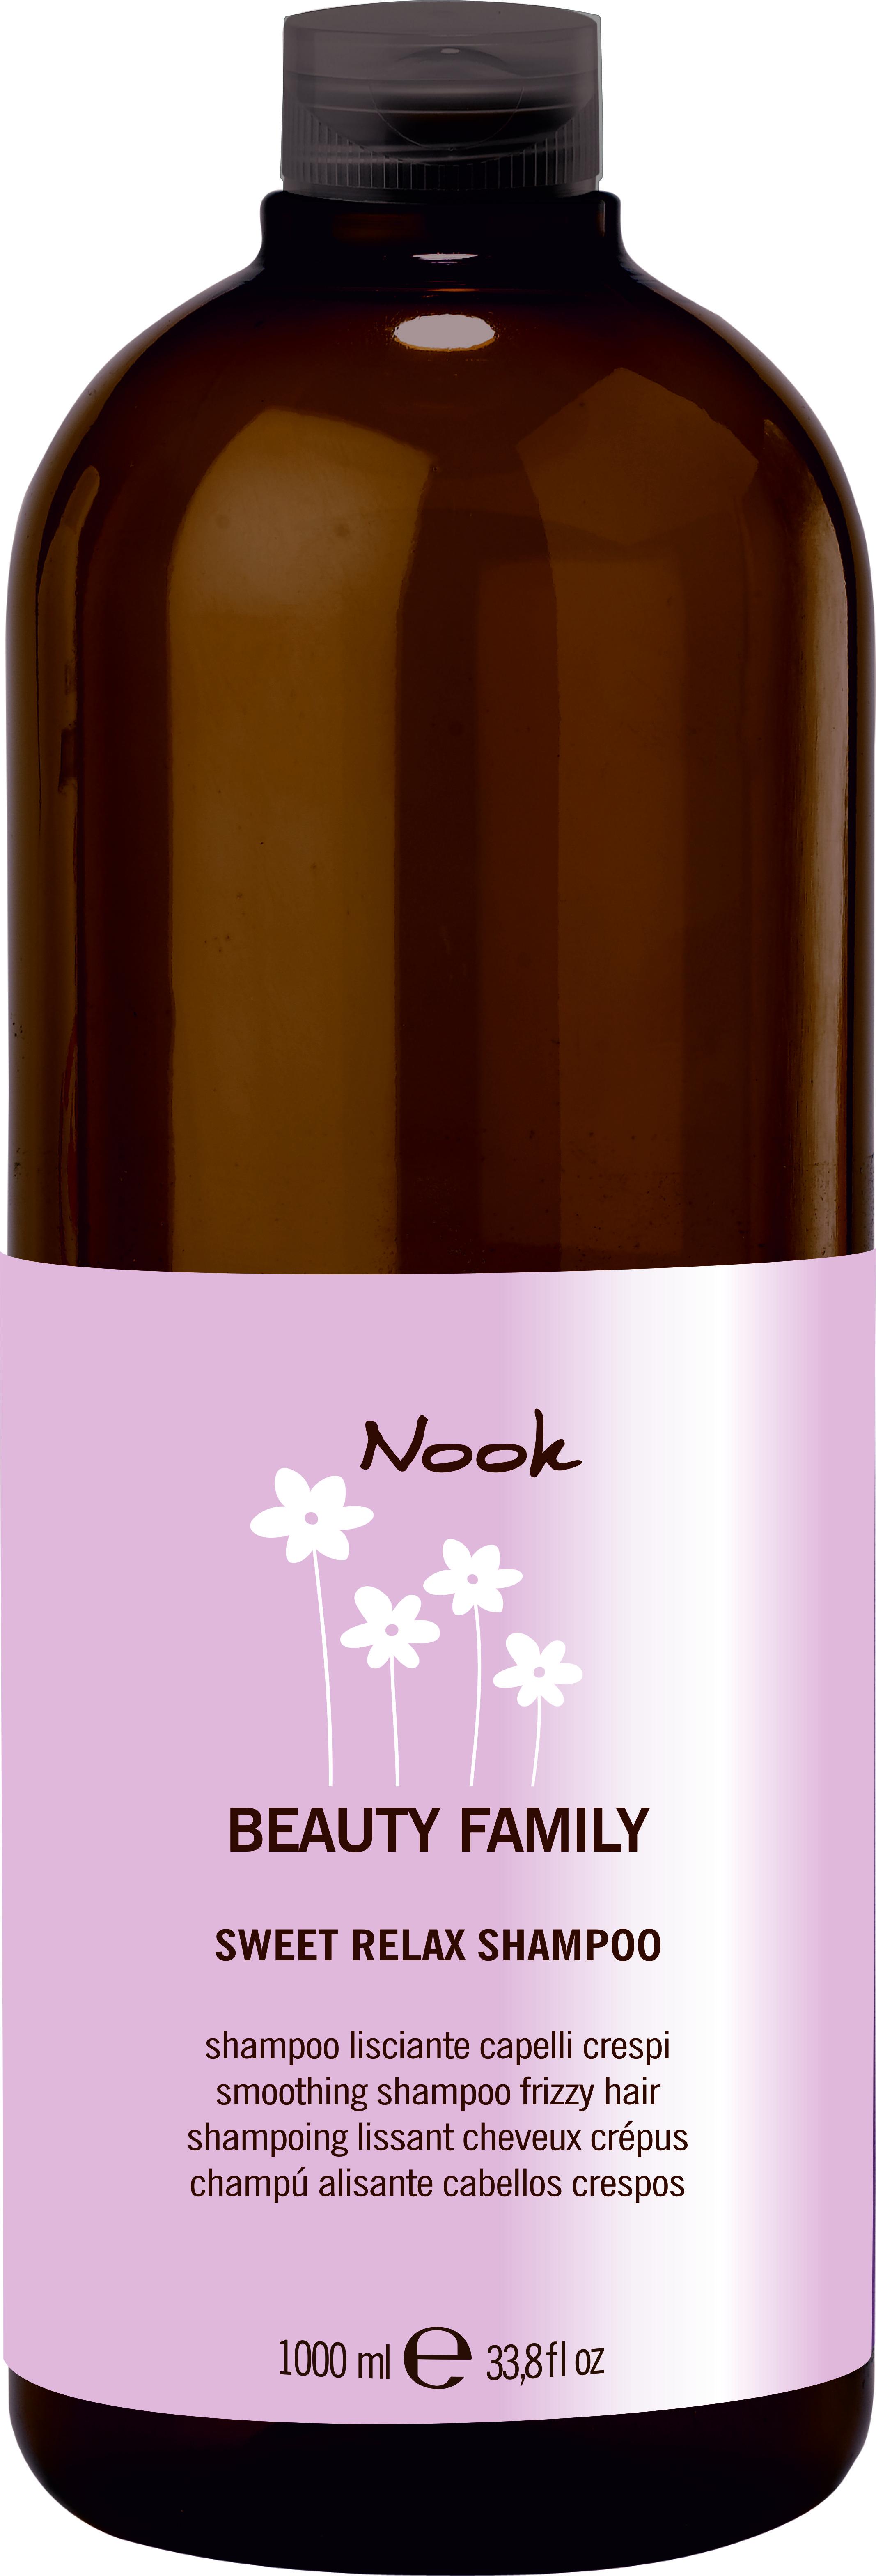 NOOK Шампунь для непослушных волос Ph 5,5 / Sweet Relax Shampoo BEAUTY FAMILY 1000мл